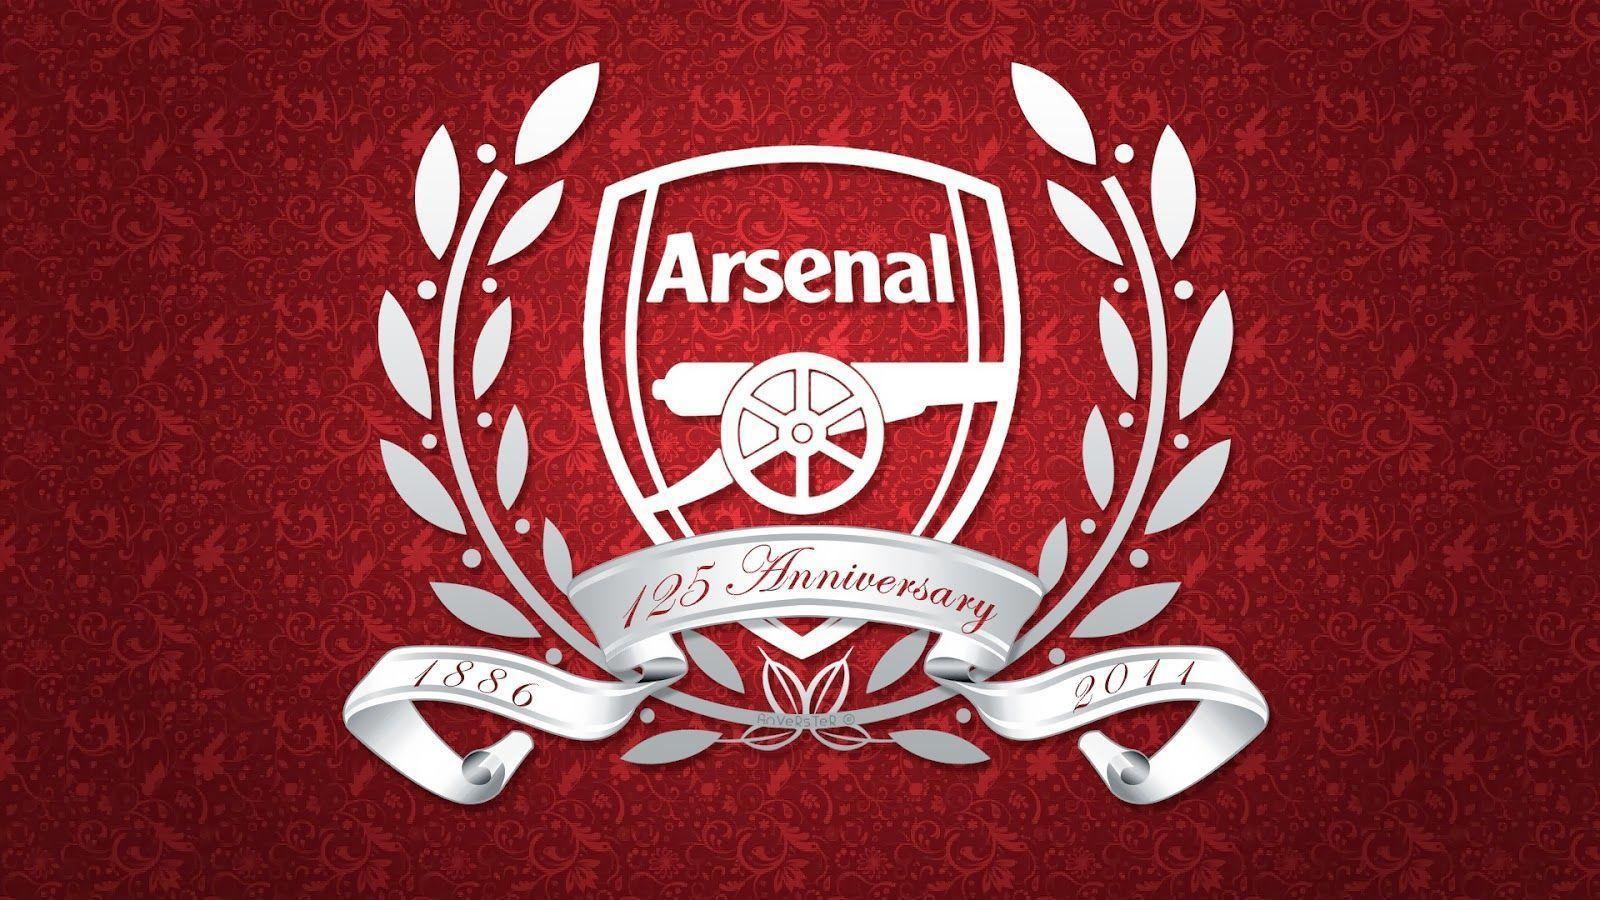 Arsenal Logo Wallpapers 2017 - Wallpaper Cave